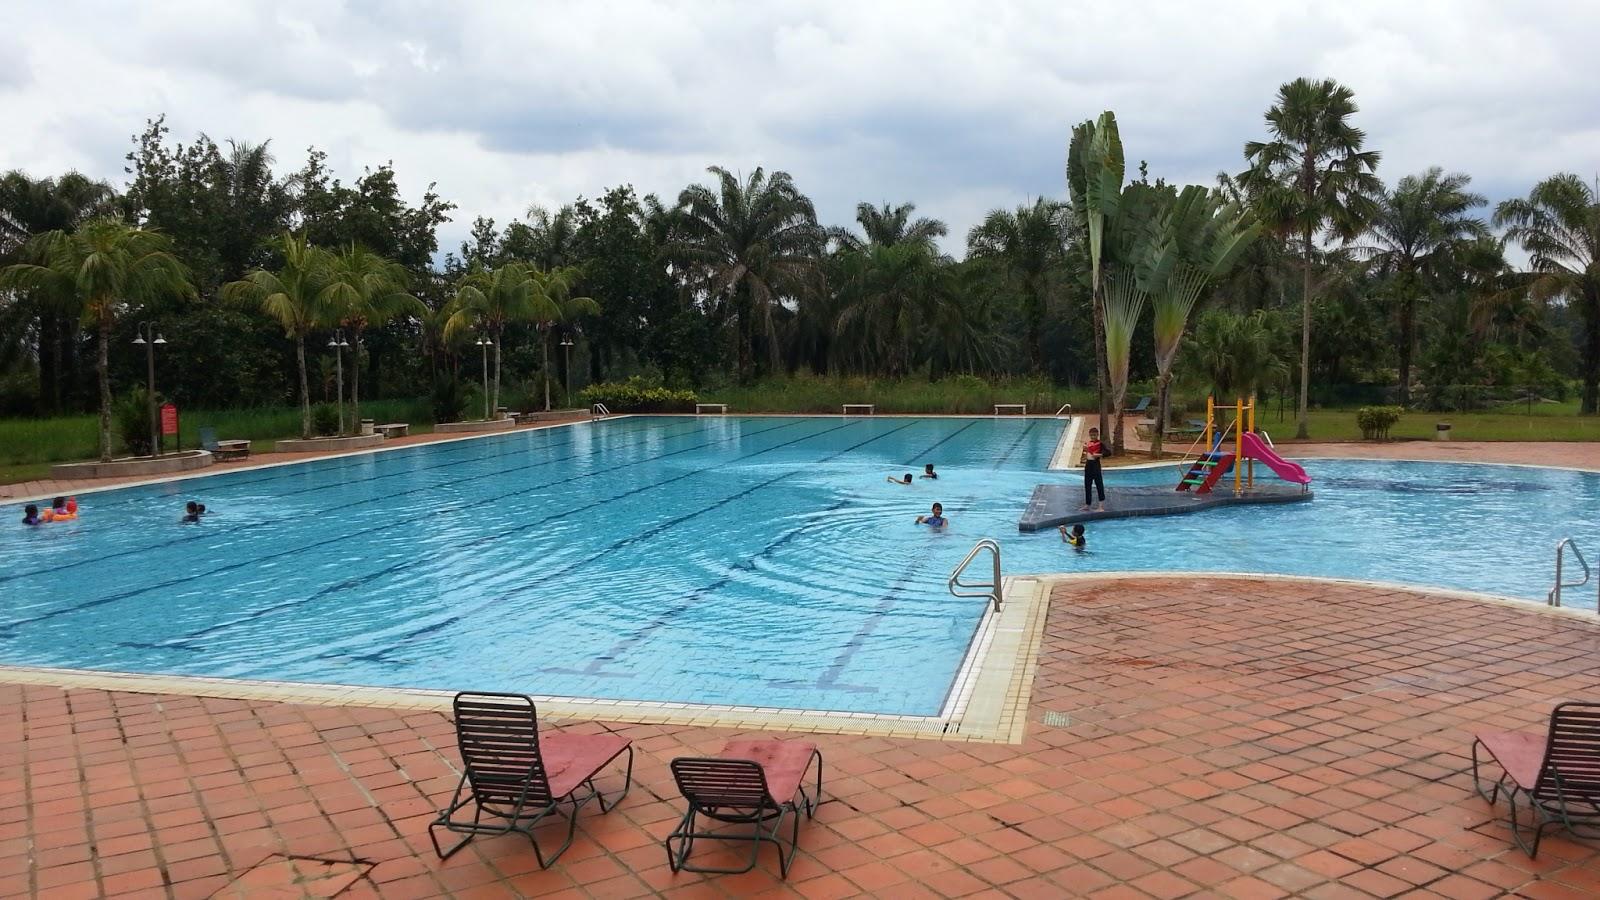 Tested and approved swimming pool at bukit beruntung golf - Club mahindra kandaghat swimming pool ...